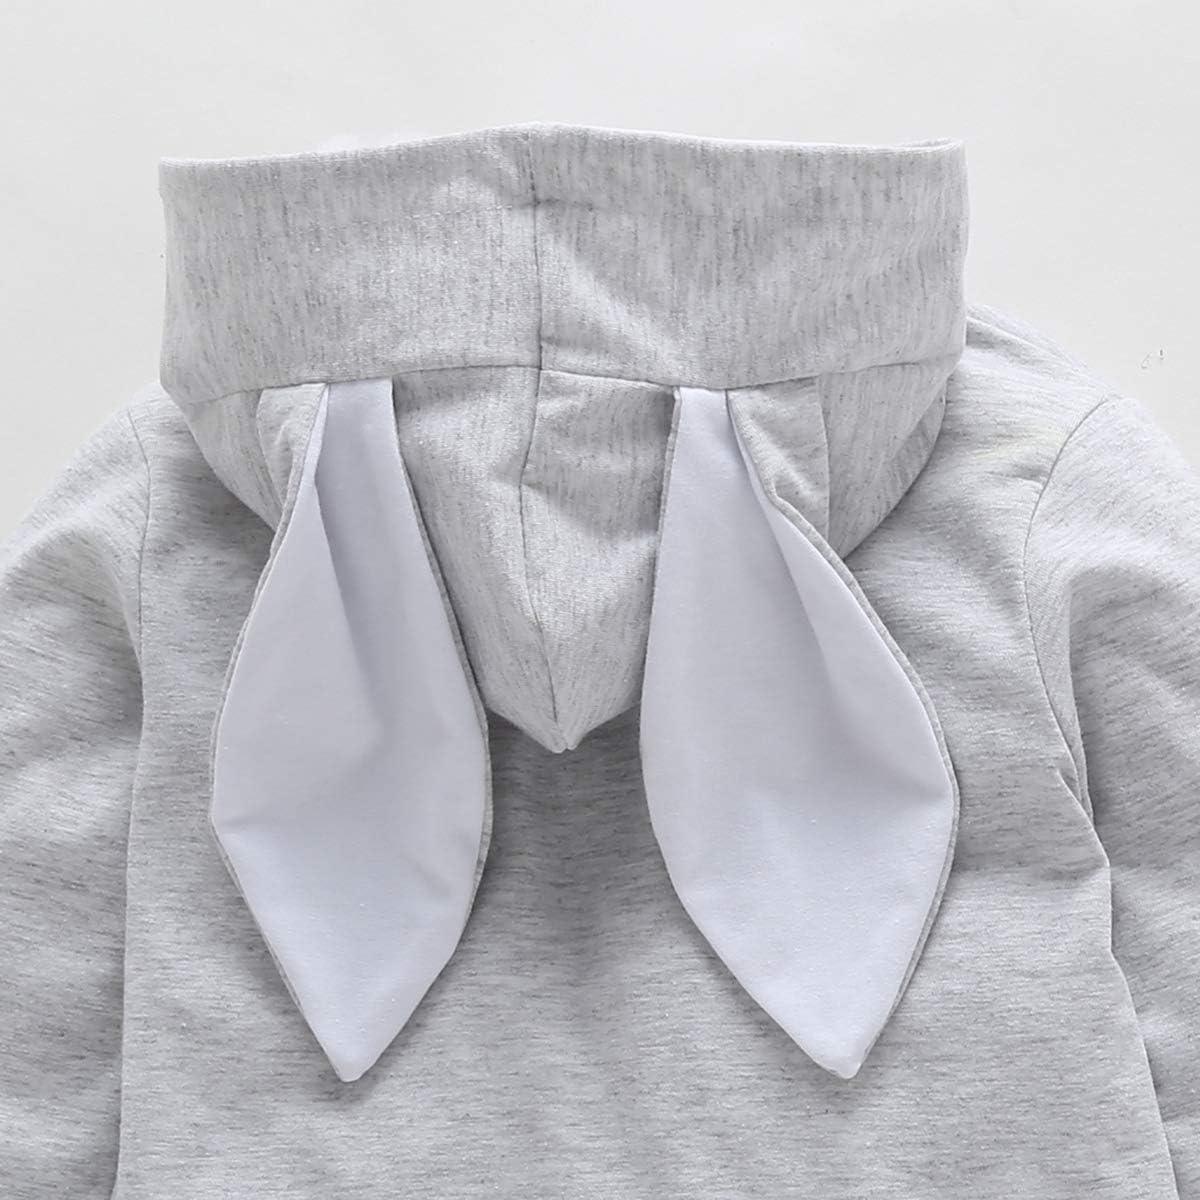 Borlai Sudadera con capucha para ni/ñas de 1 a 4 a/ños con orejas de conejo